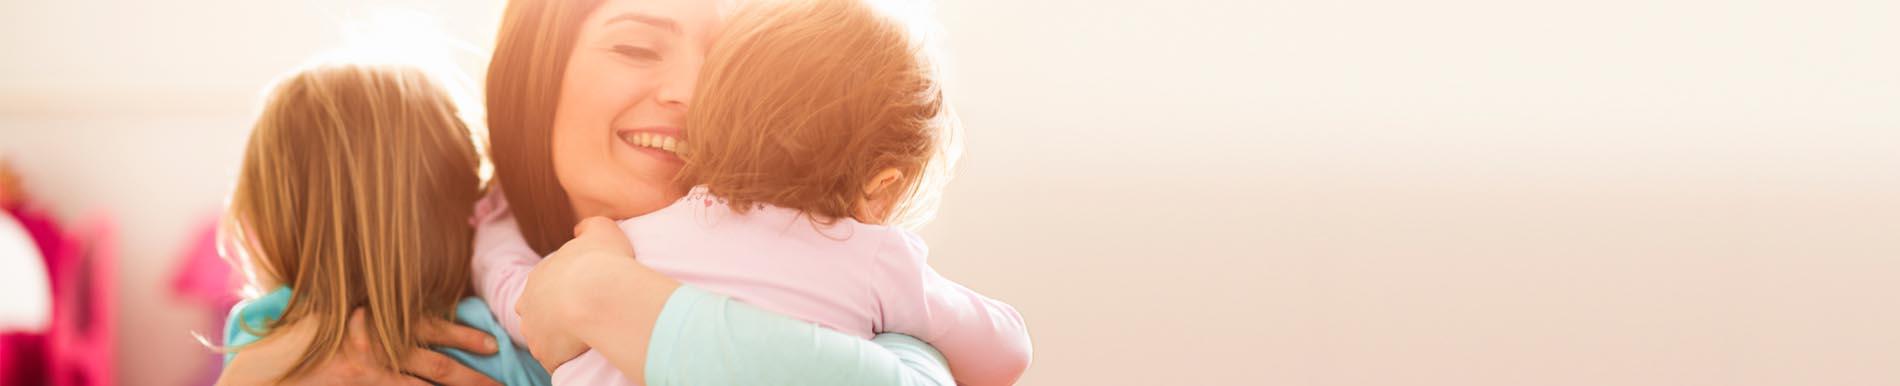 https://www.healthychildren.org/SiteCollectionImage-Homepage-Banners/mom_hug_babies_sweet_md_banner.jpg